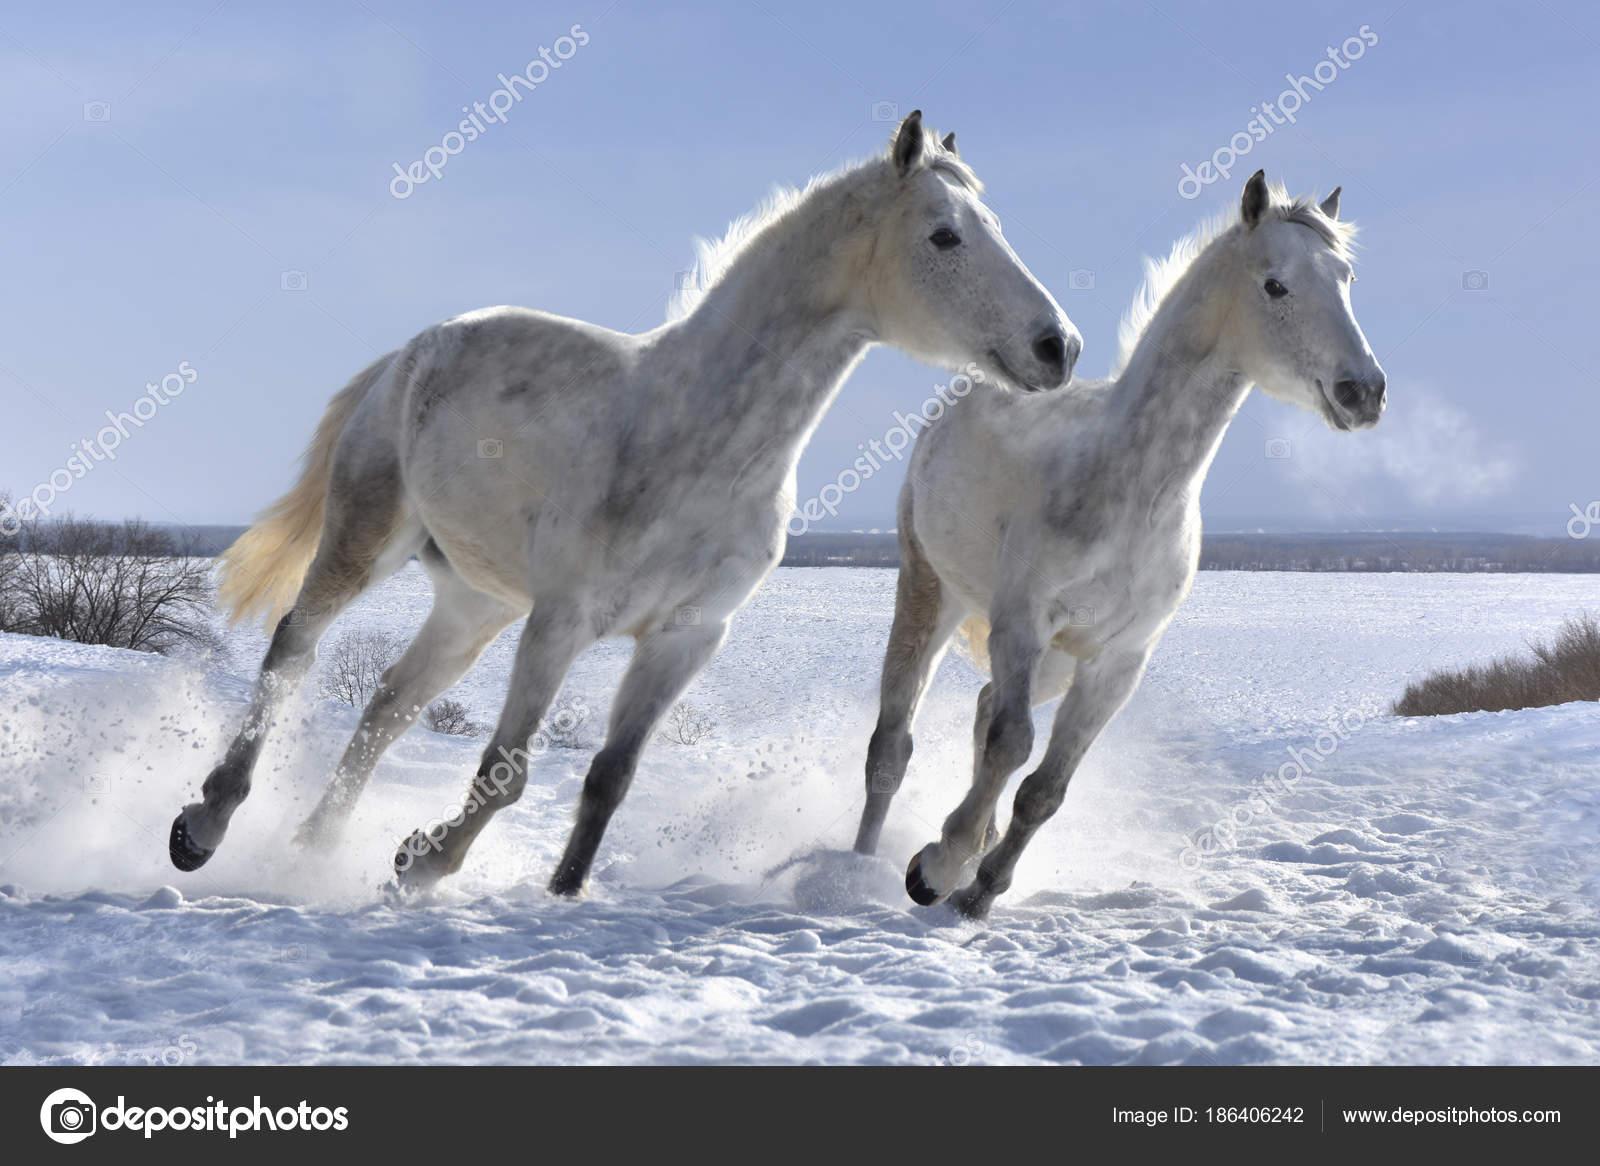 White Horses Jumping White Snow Stock Photo C Astroida List Ru 186406242